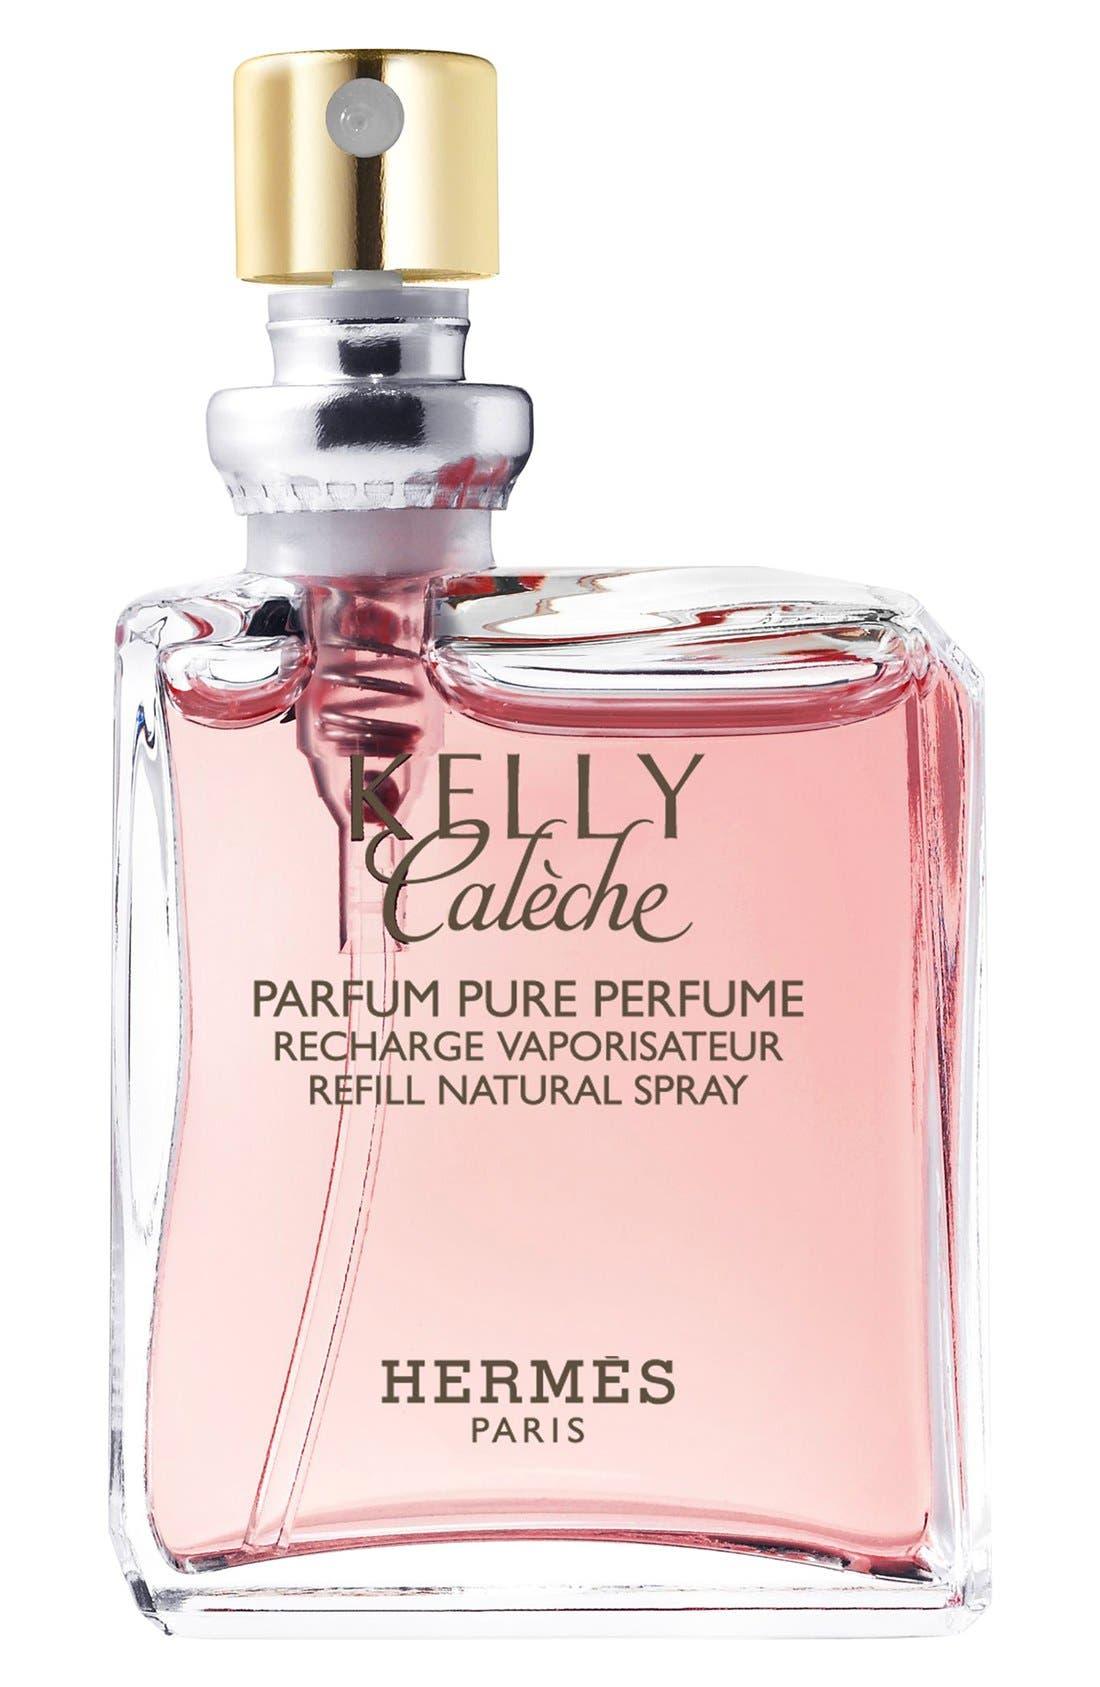 Hermès Kelly Calèche - Pure perfume lock refill